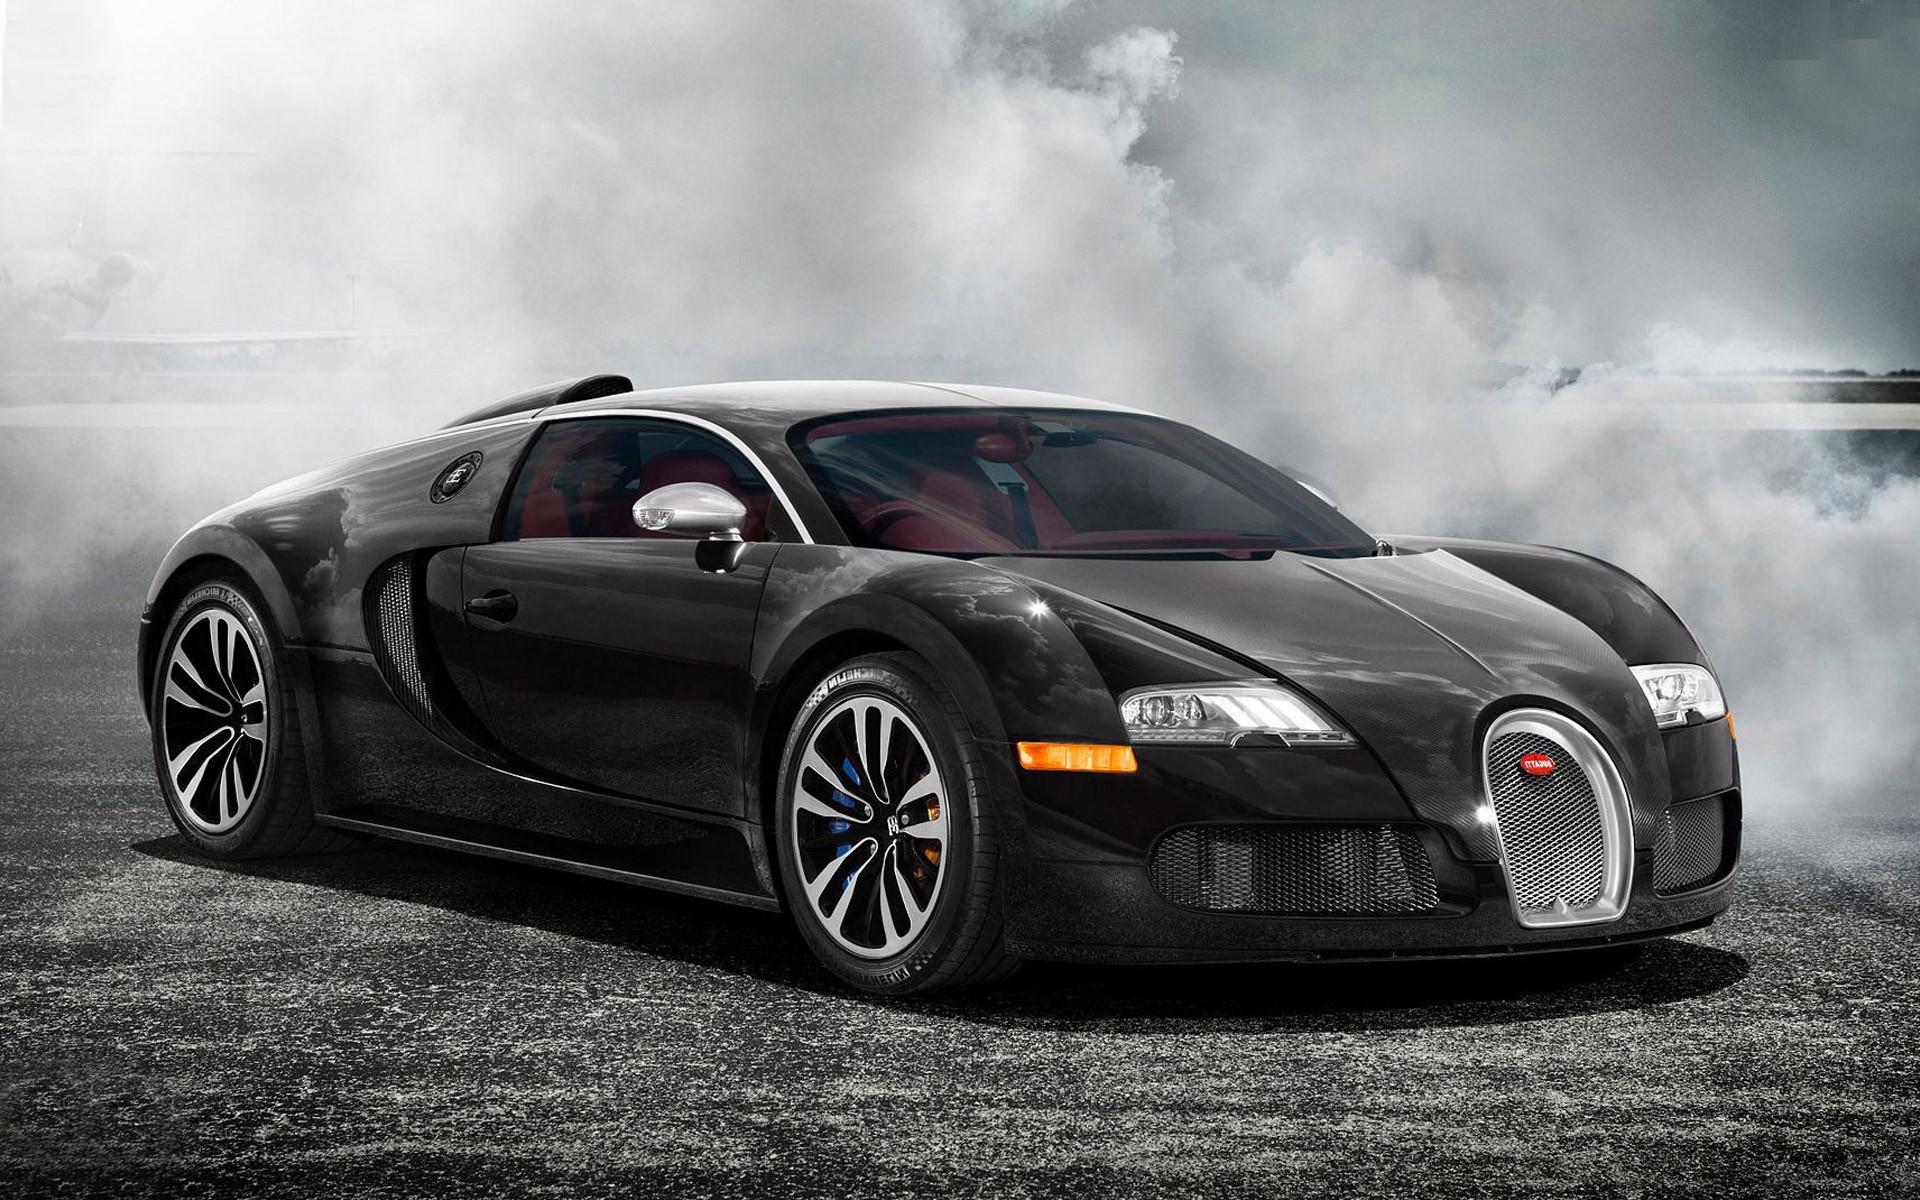 Sport Wallpaper Bugatti Veyron: Black Bugatti Veyron Wallpaper ·① WallpaperTag